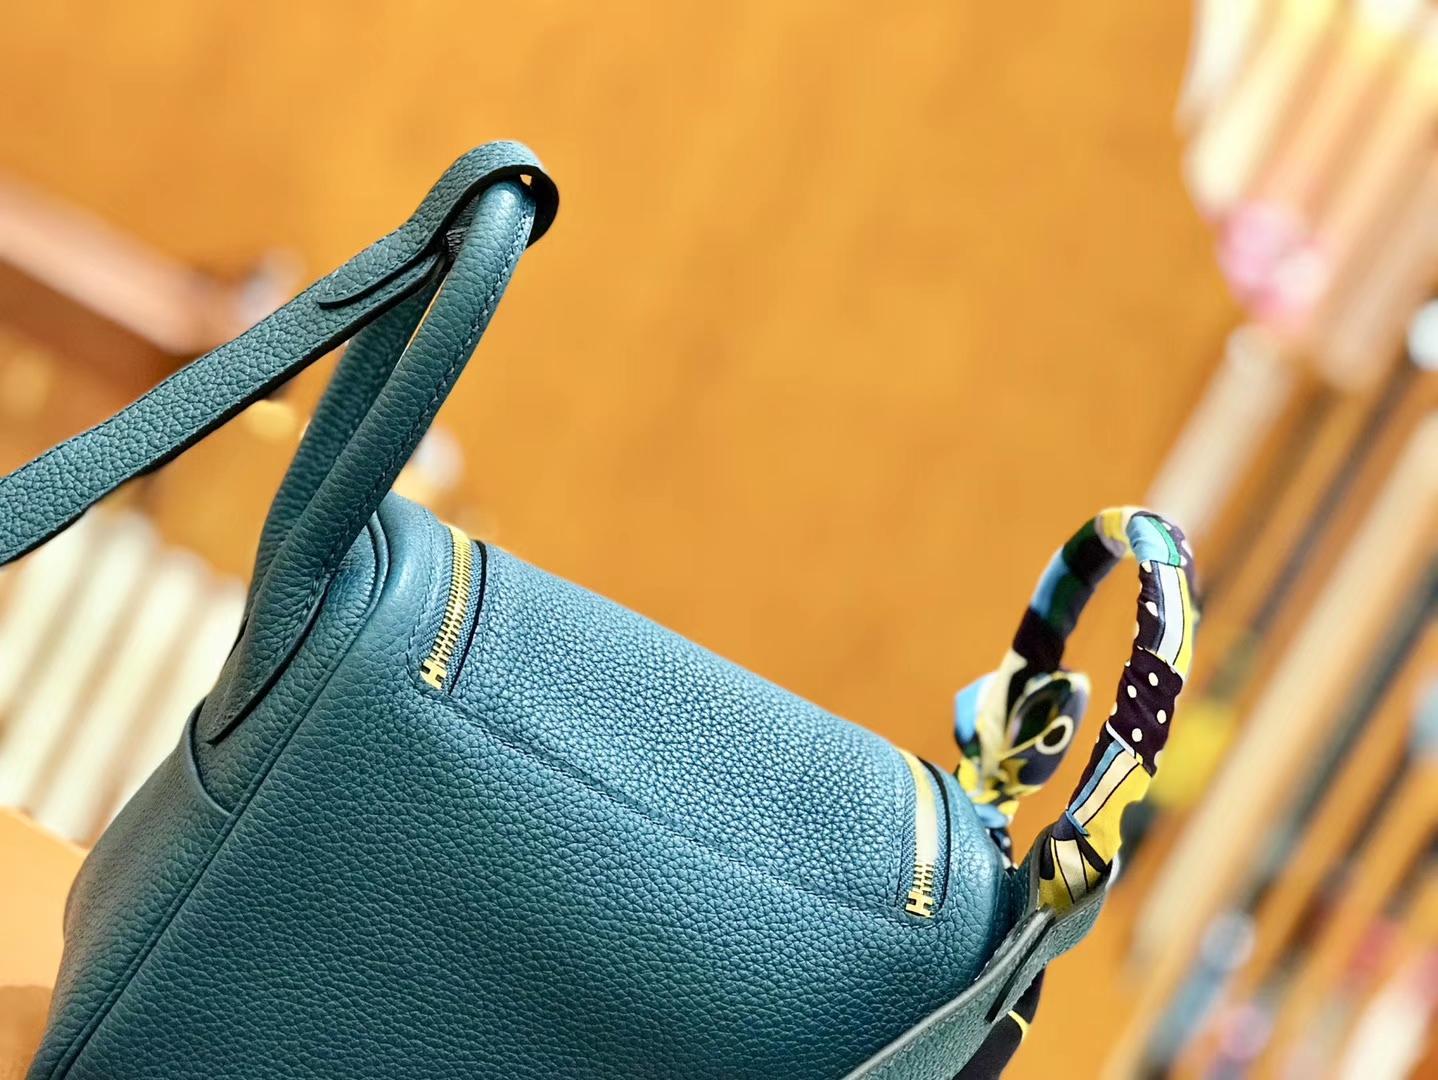 Hermès(爱马仕)Lindy 18cm 靛蓝色 金扣 全手工缝制